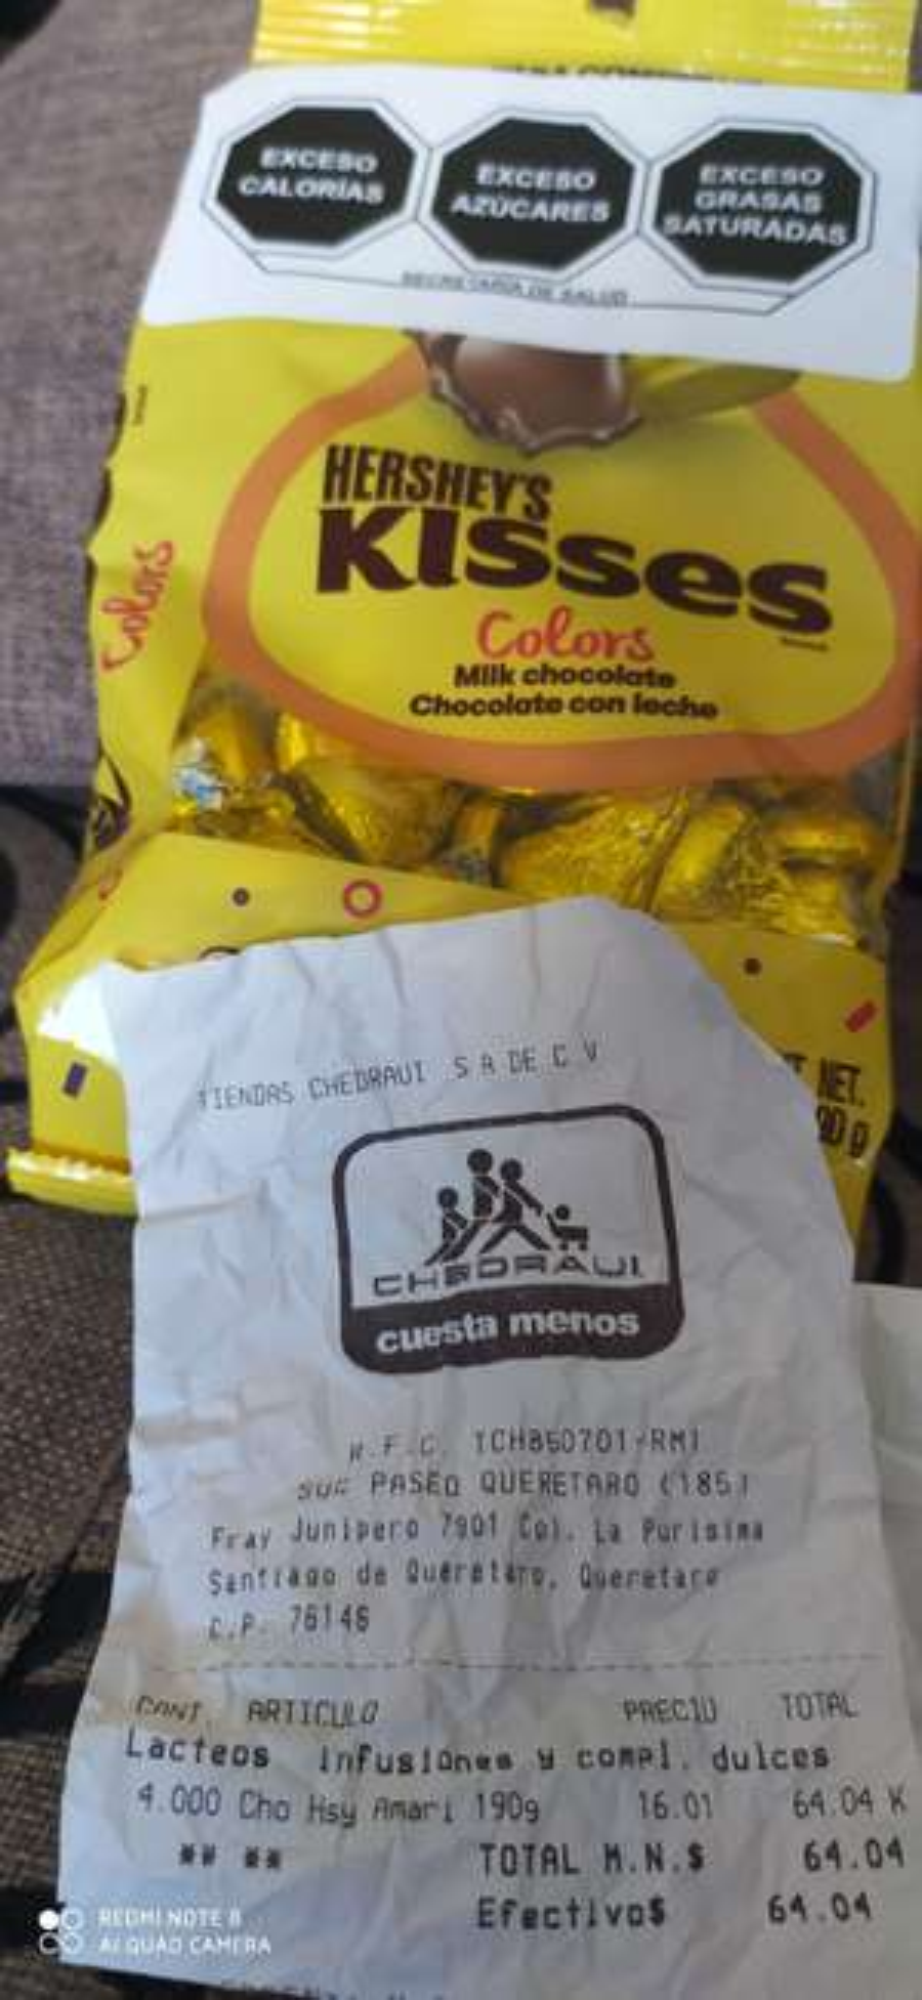 Chedraui Hershey's Kisses